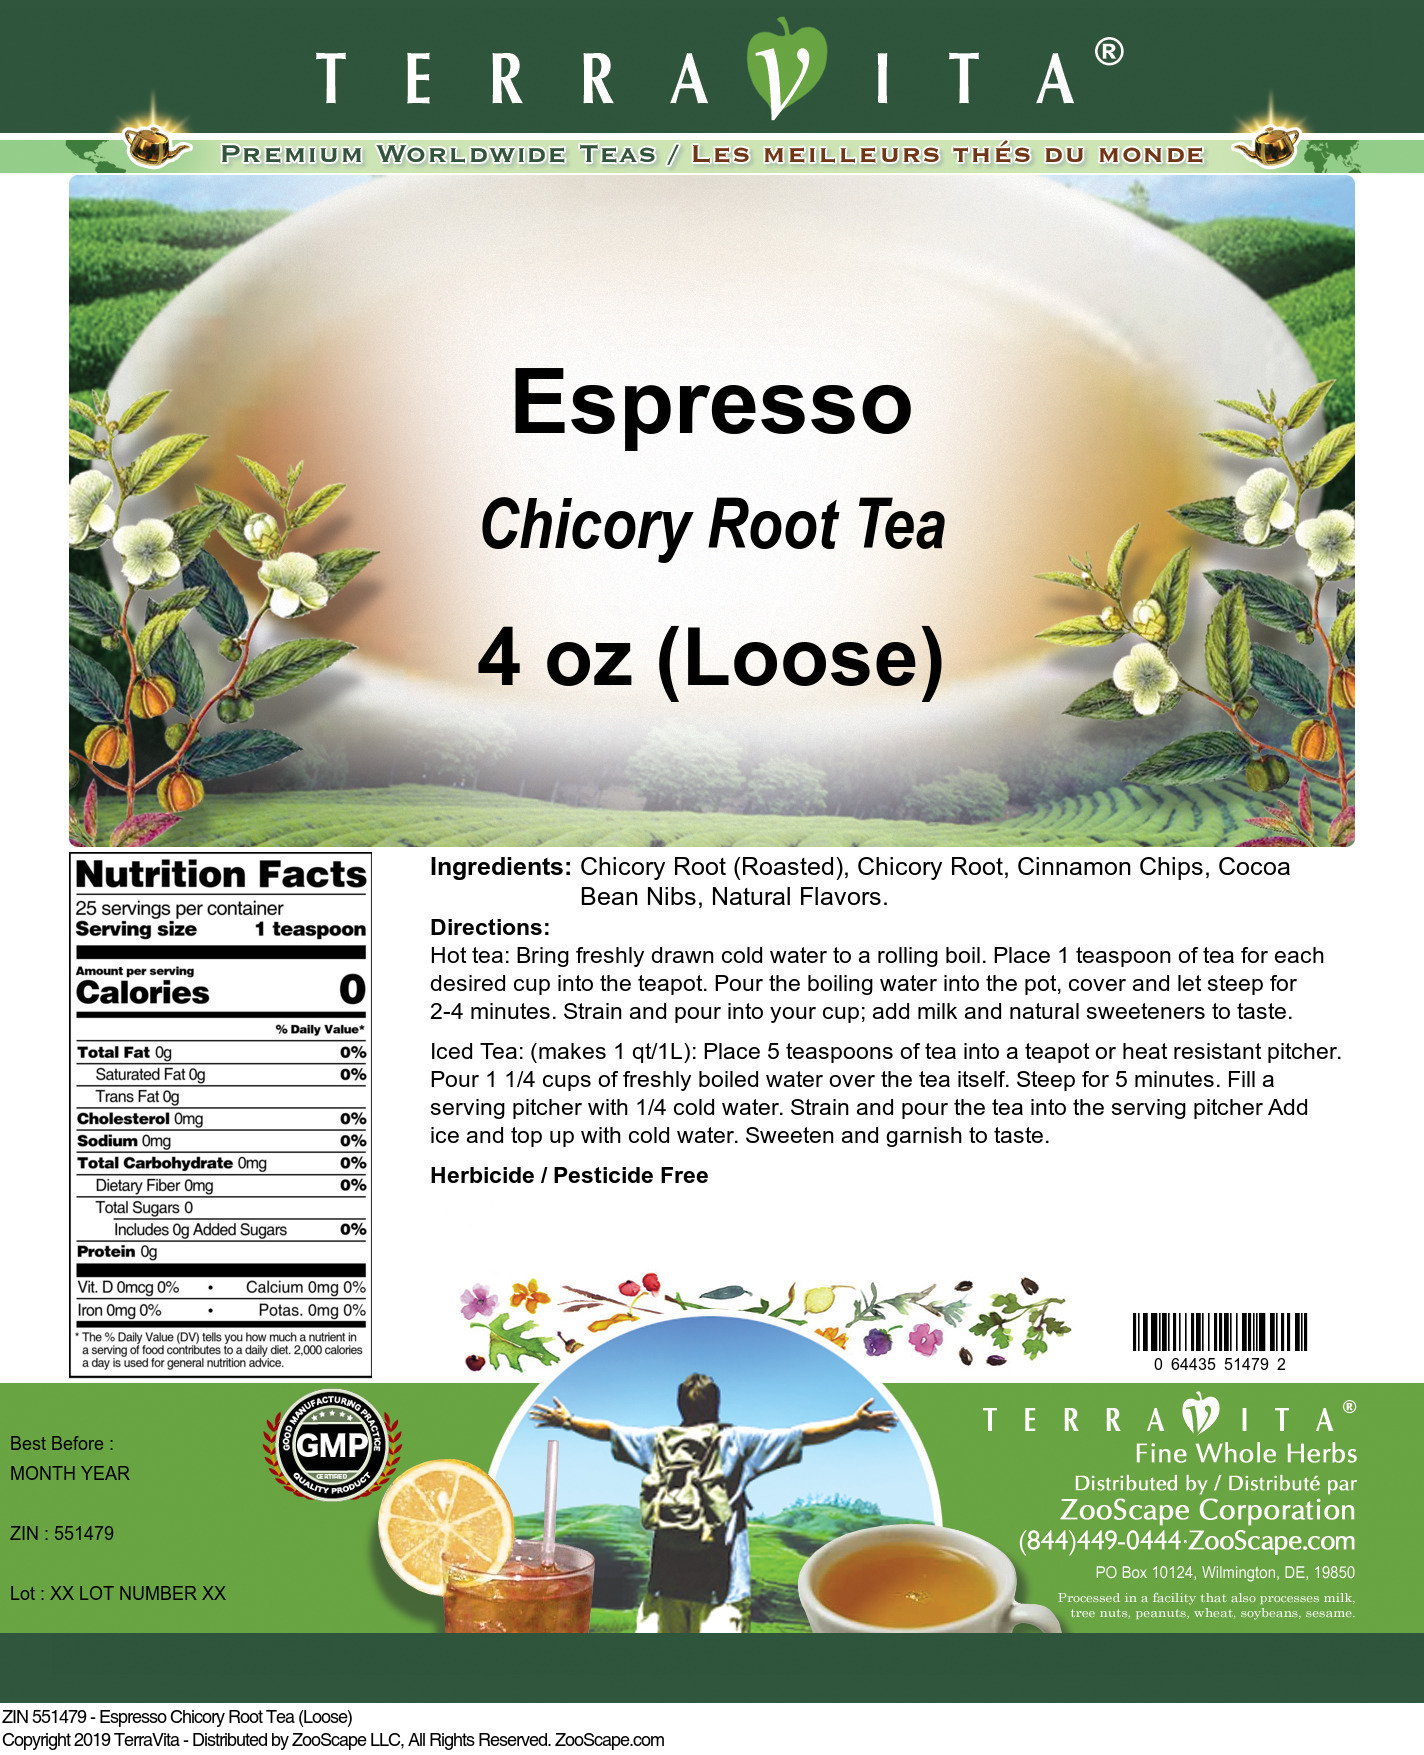 Espresso Chicory Root